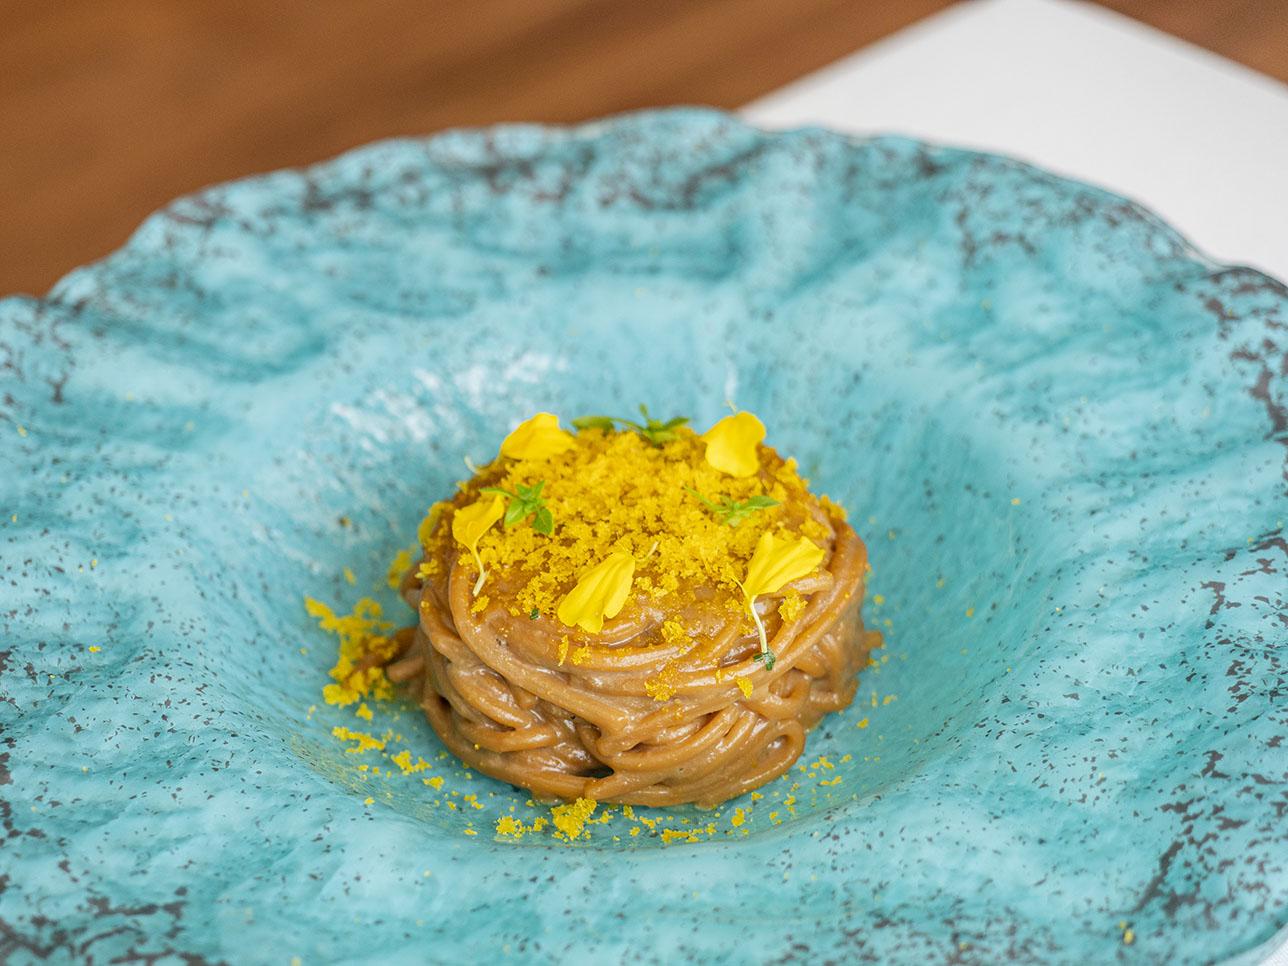 Spaghetti alla carbonara de galera de Ferdinando Bernardi